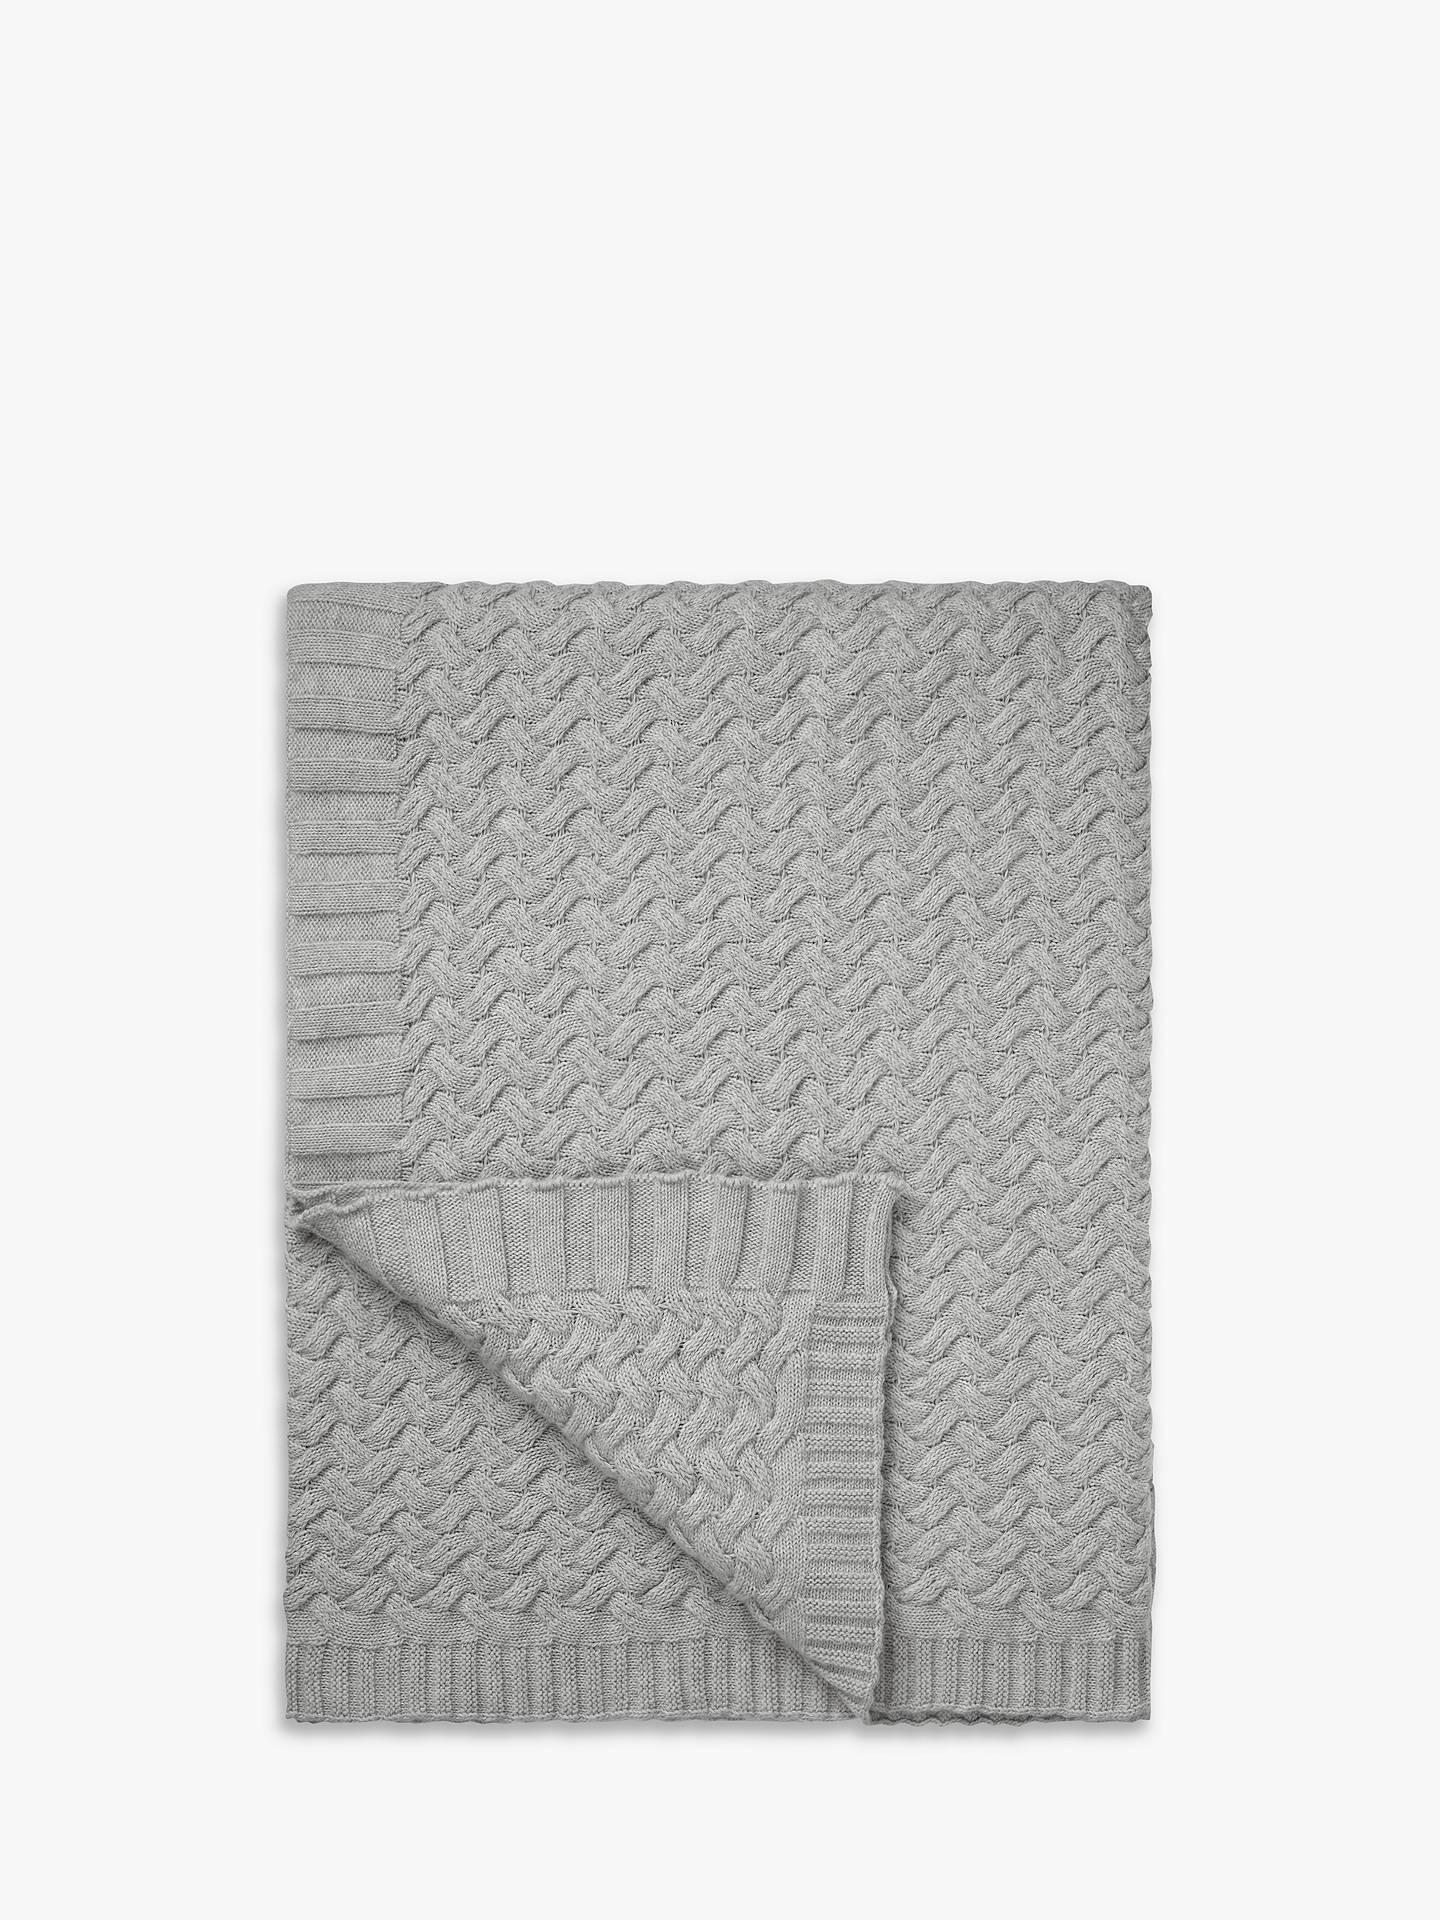 john lewis partners knitted waves throw at john lewis. Black Bedroom Furniture Sets. Home Design Ideas